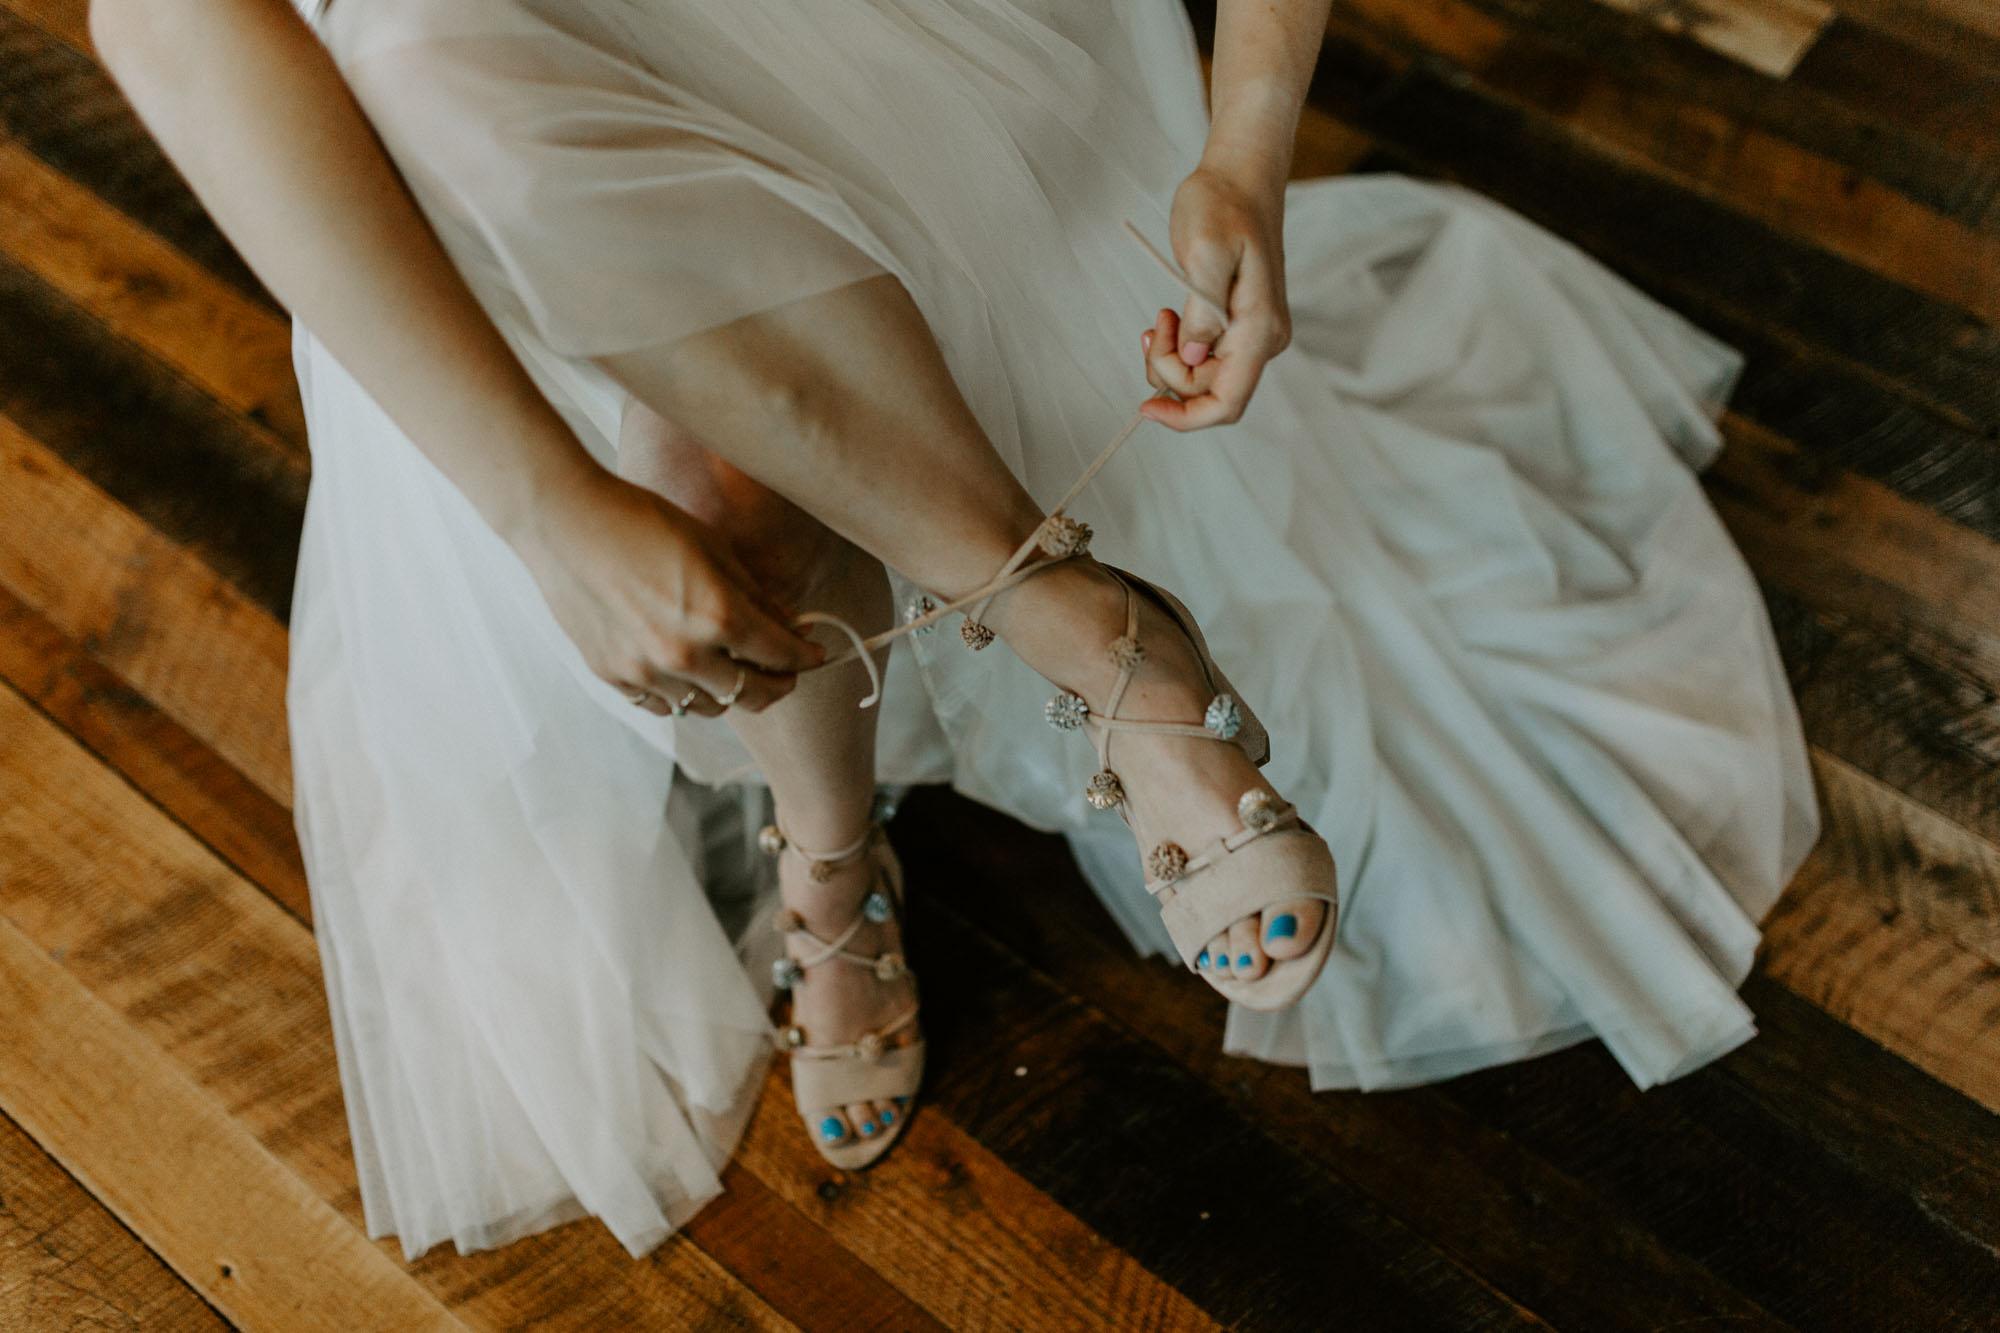 journeyman_distillery_wedding_photographer_chicago_il_wright_photographs-1142.jpg